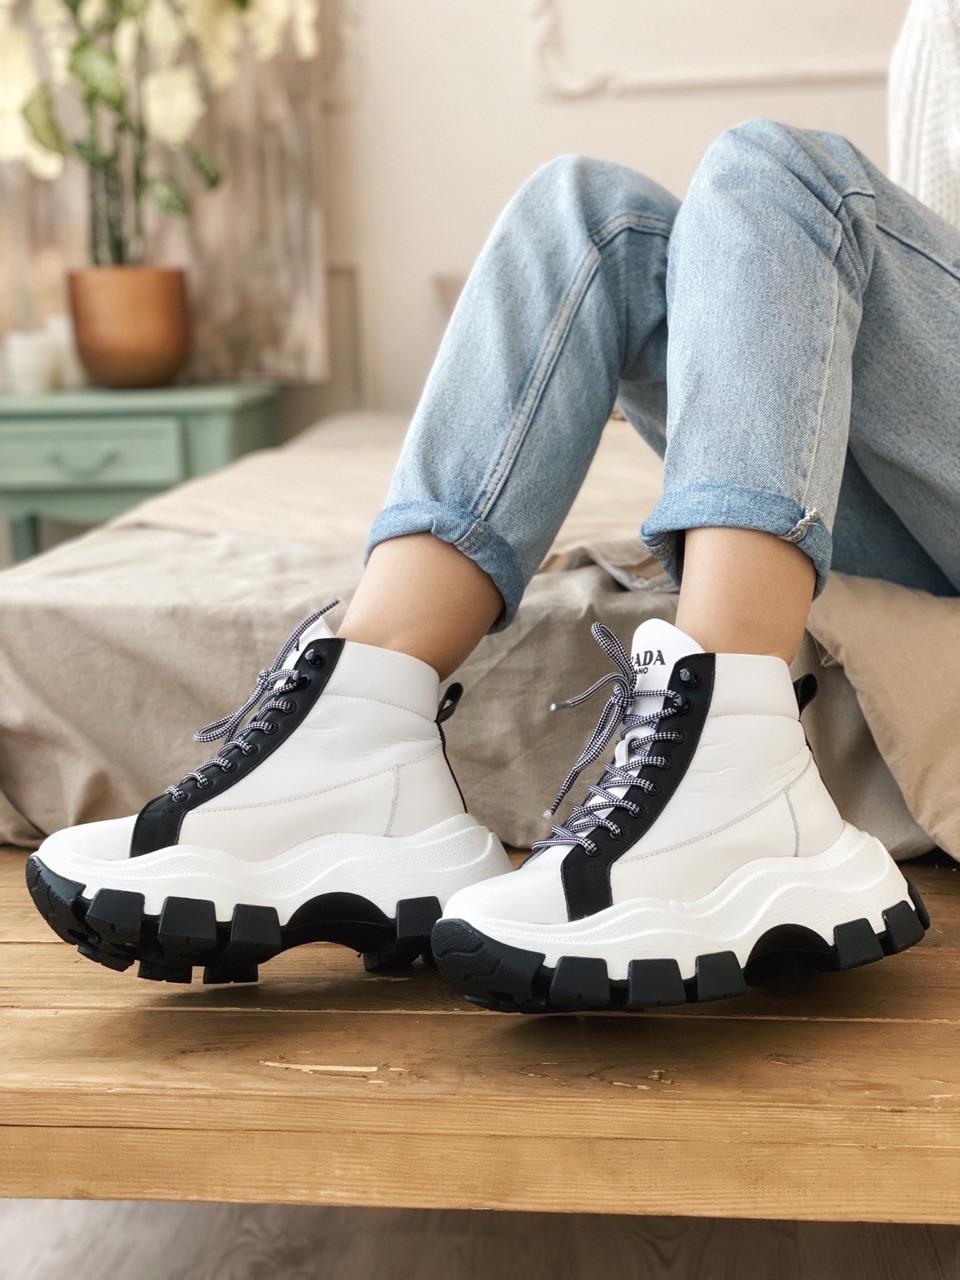 Кросівки Prada Milano Sneakers Block White Black (Кросівки Прада Мілано)